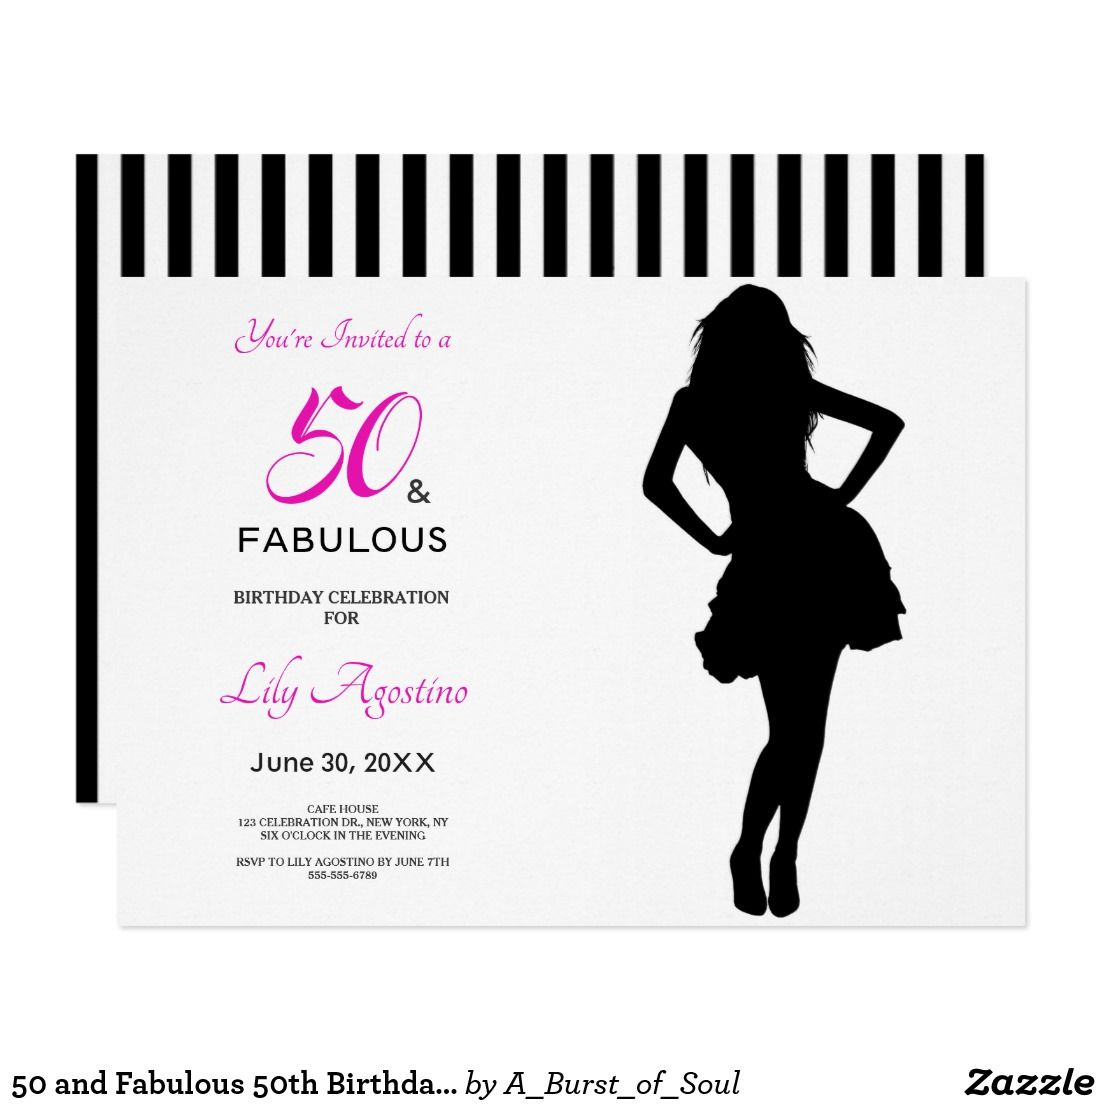 50 and Fabulous 50th Birthday Invitation | Pinterest | 50th birthday ...